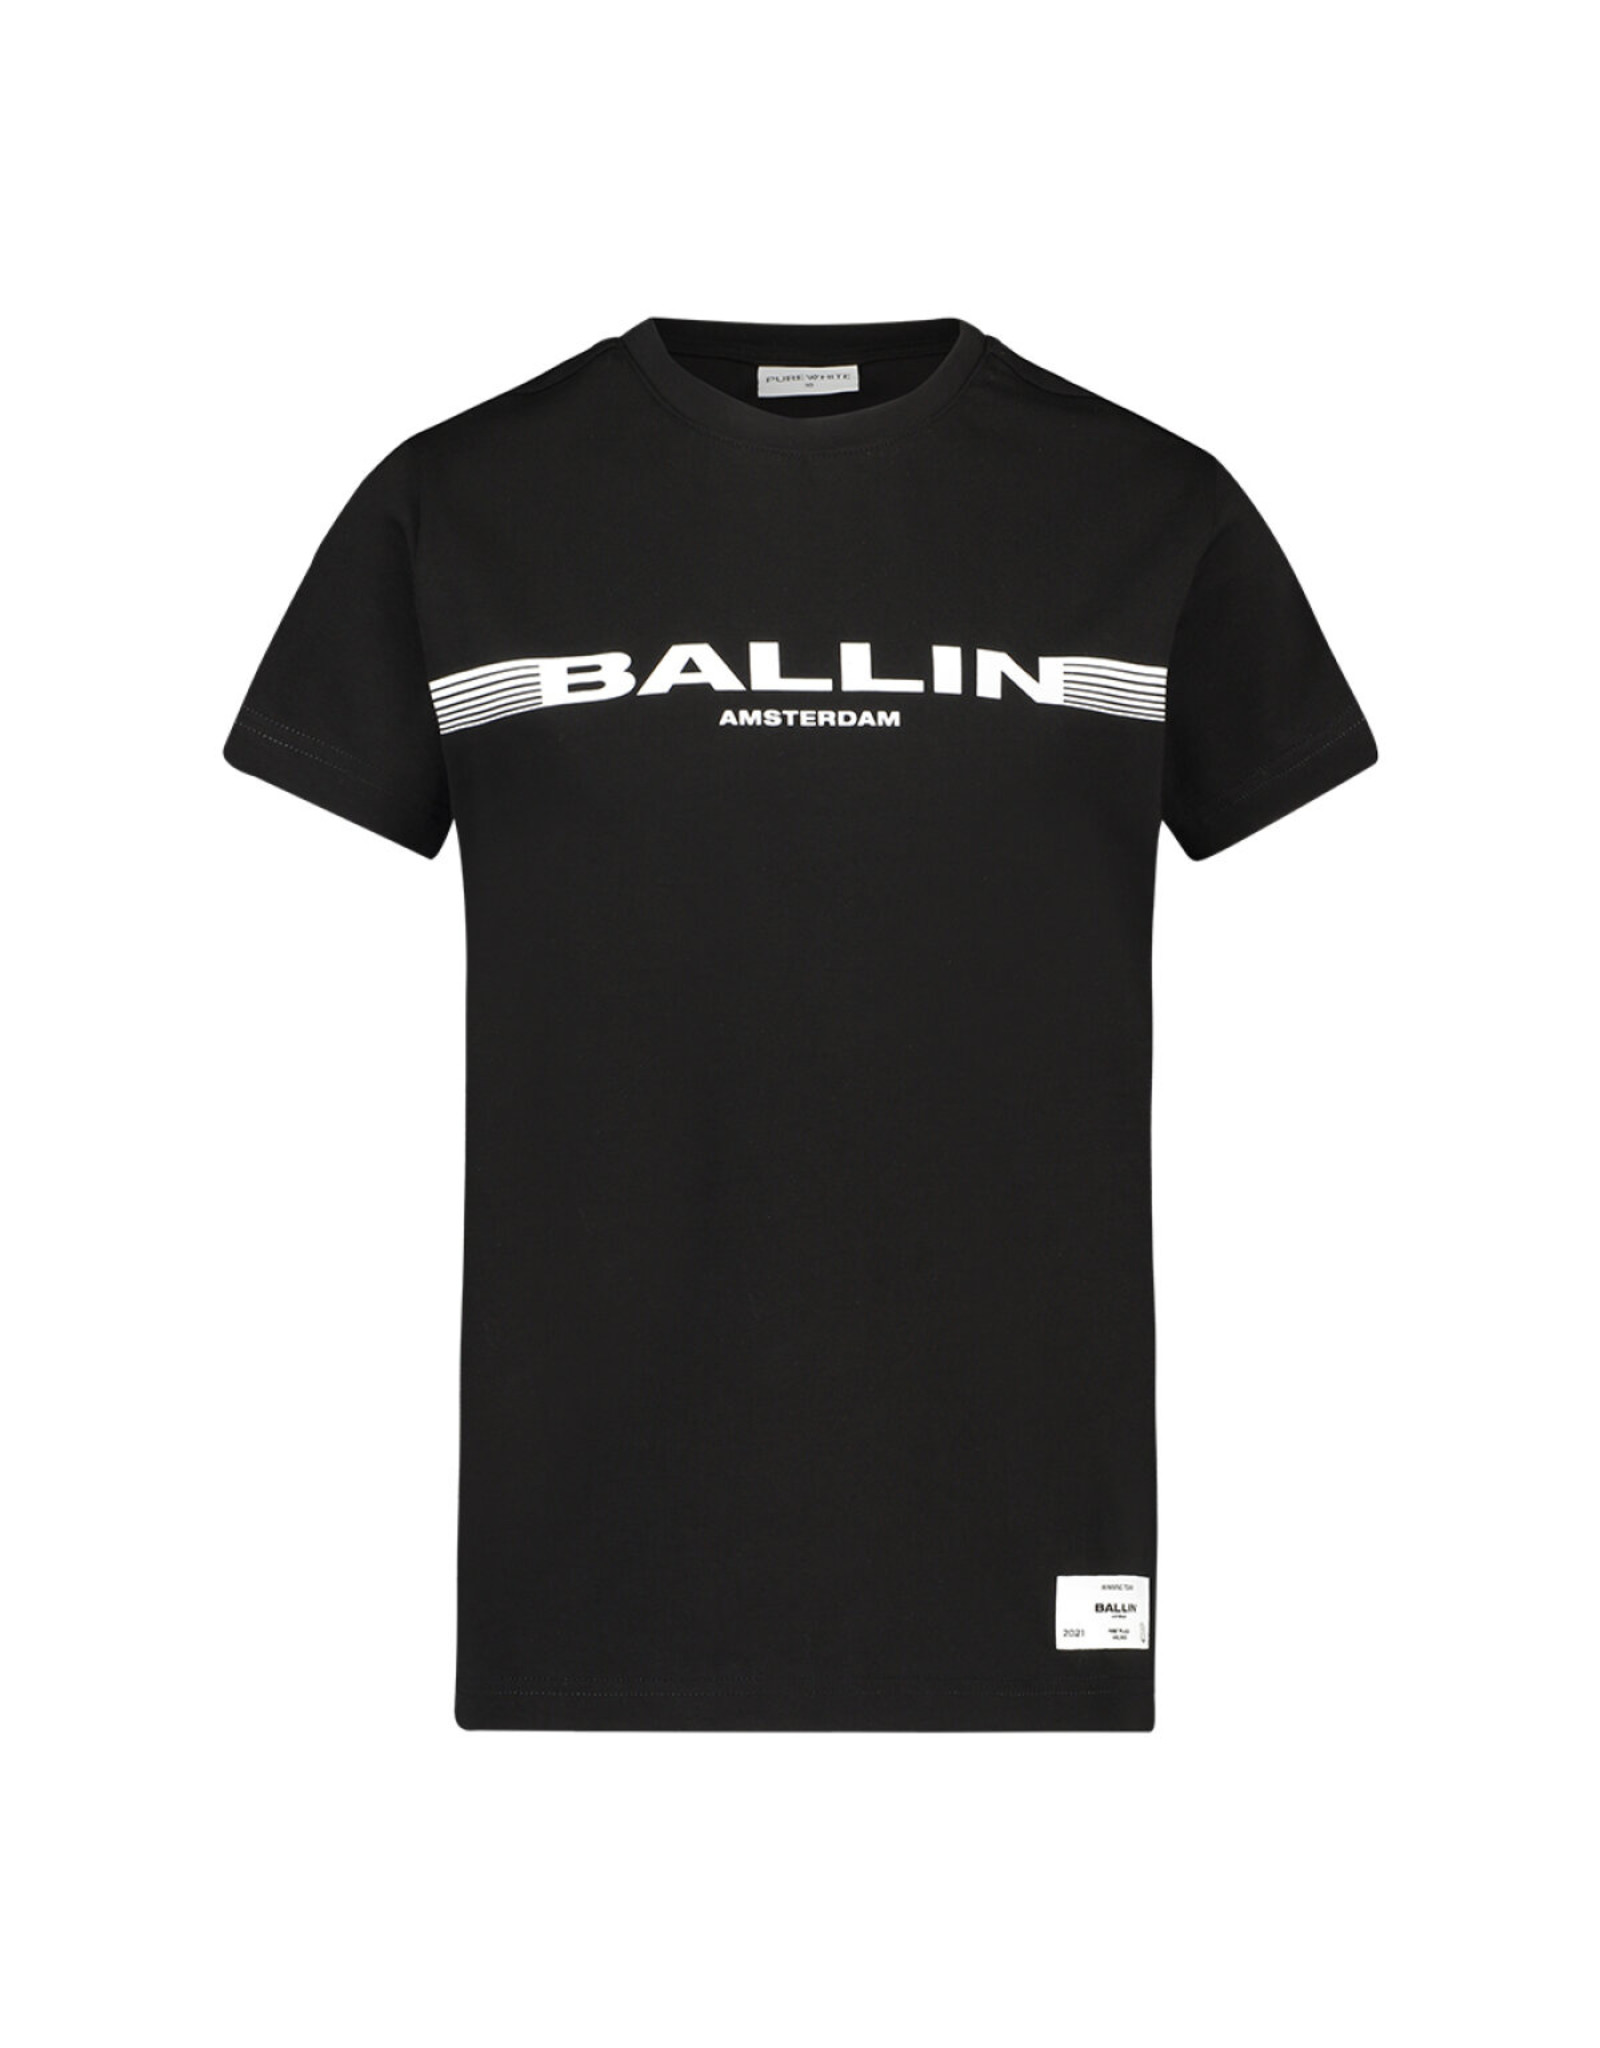 Ballin Amsterdam T-shirt Black